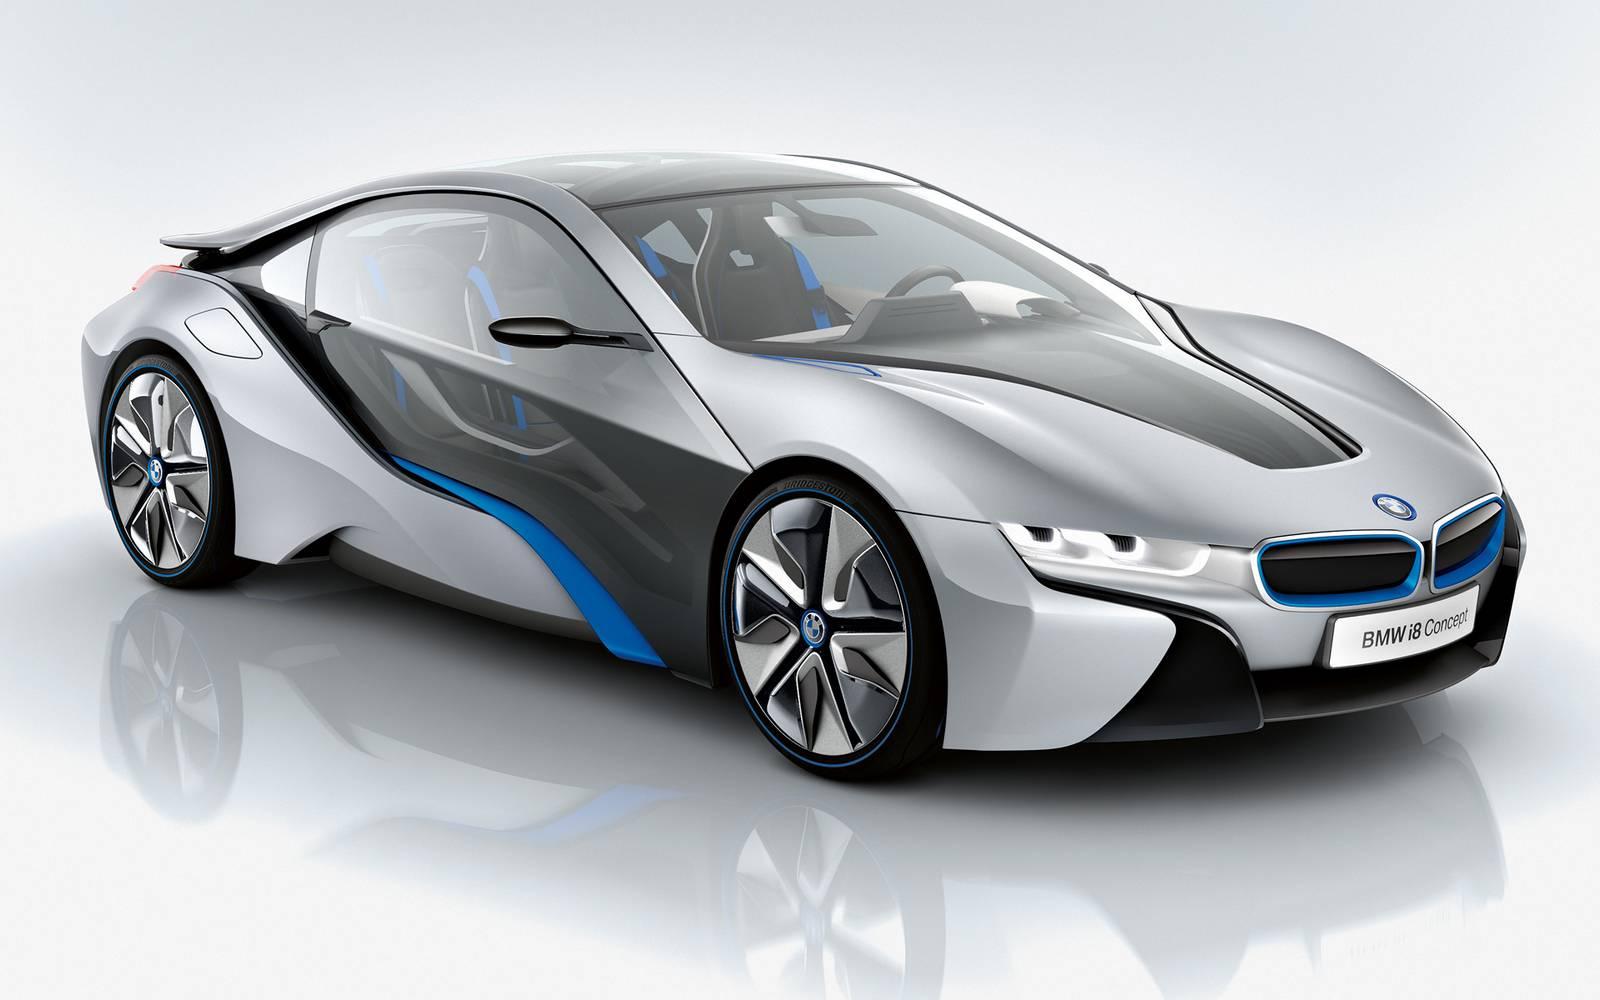 BMW I To Debut At Frankfurt Motor Show GTspirit - 2014 bmw car